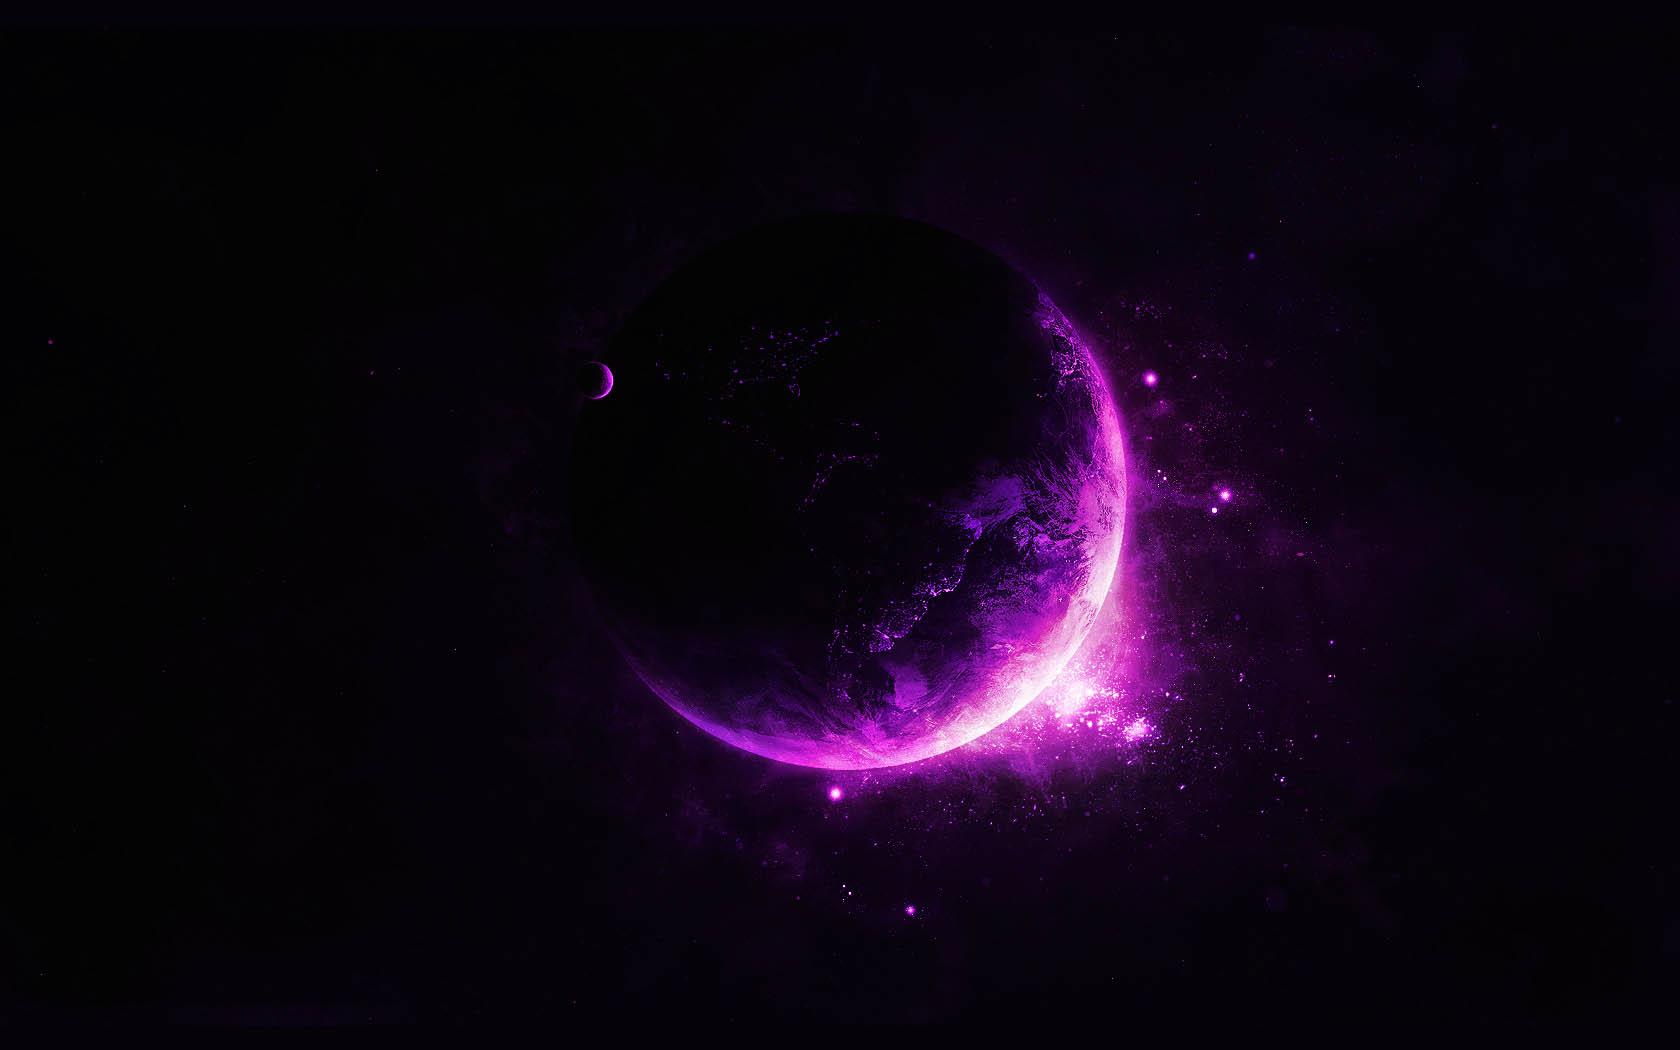 Purple Moon Wallpaper 3284 Hd Wallpapers in Space   Imagescicom 1680x1050